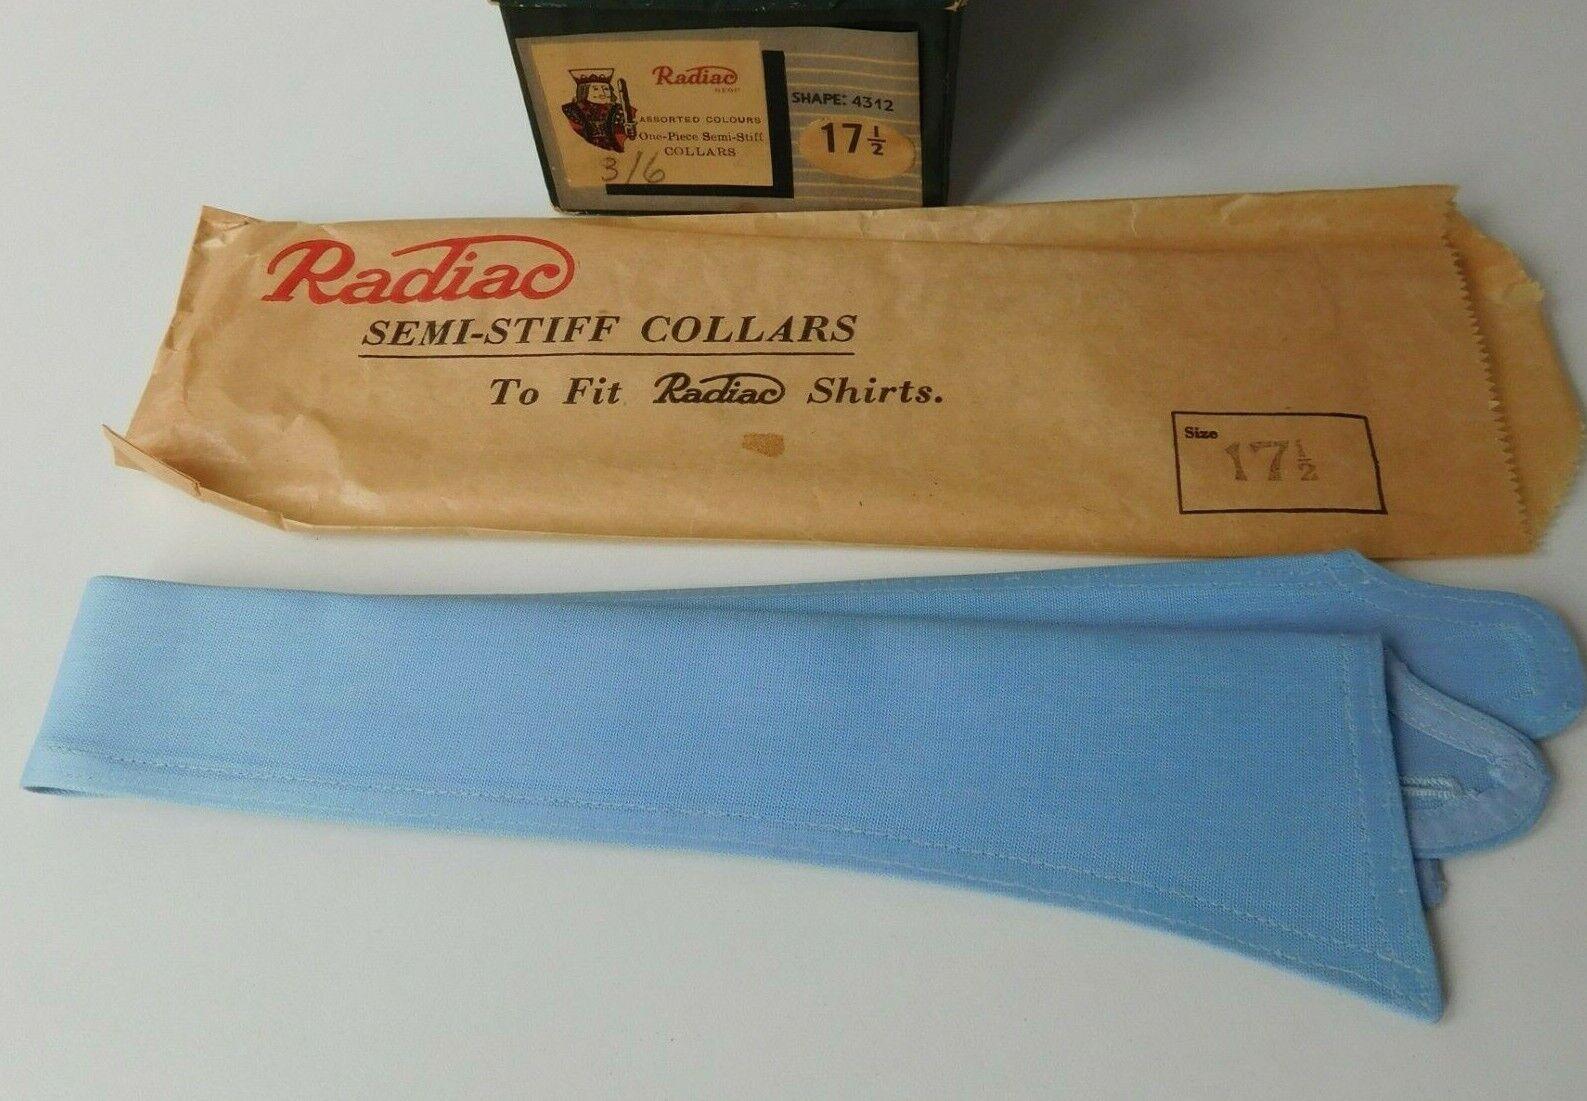 Vintage Radiac blue shirt collar size 17.5 semi-stiff UNUSED detachable perfect